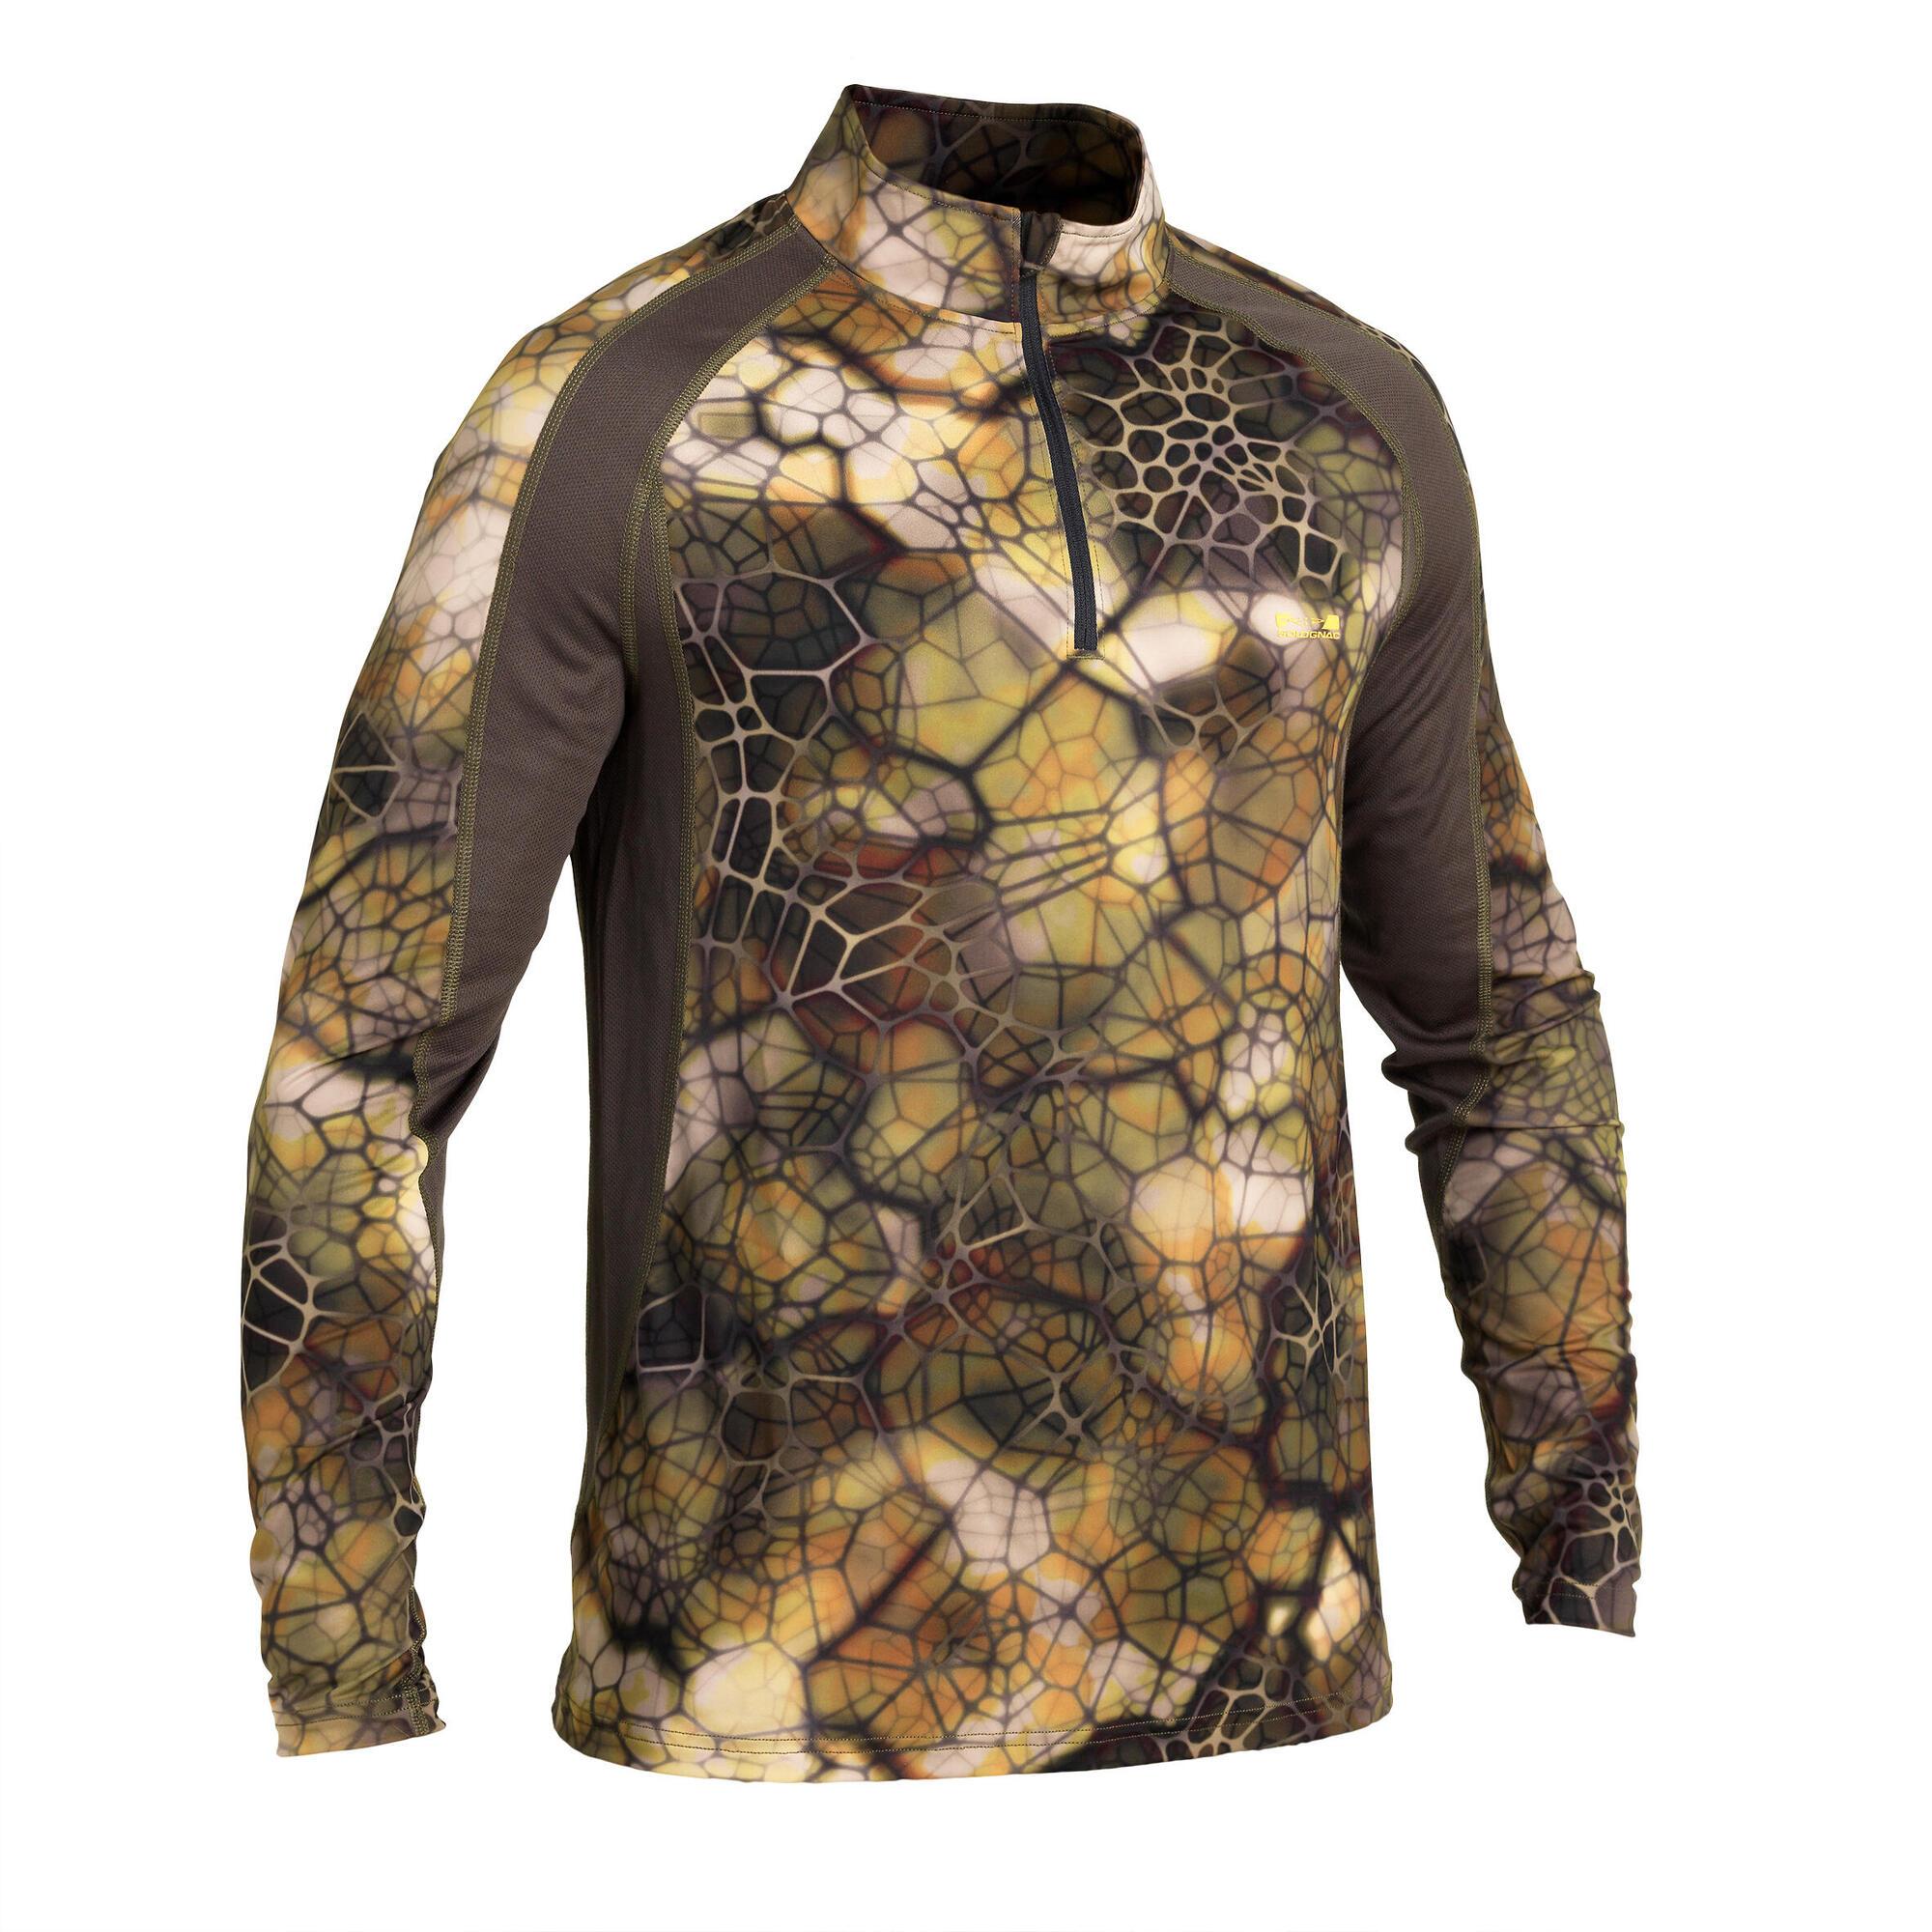 Actikam 500 T Shirt Light Camouflage Furtiv Solognac